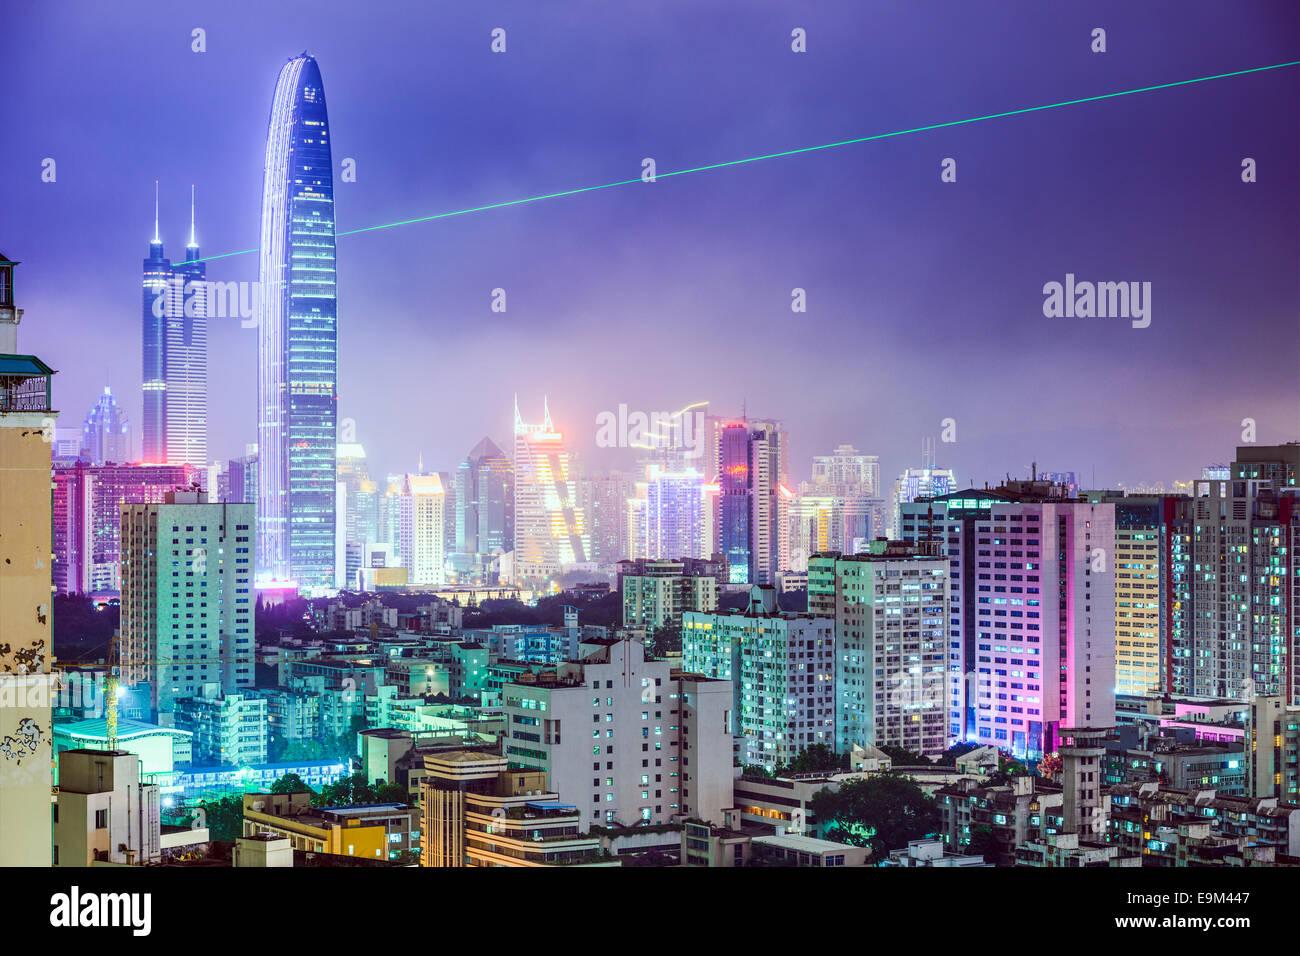 Shenzhen, China city skyline at night. - Stock Image